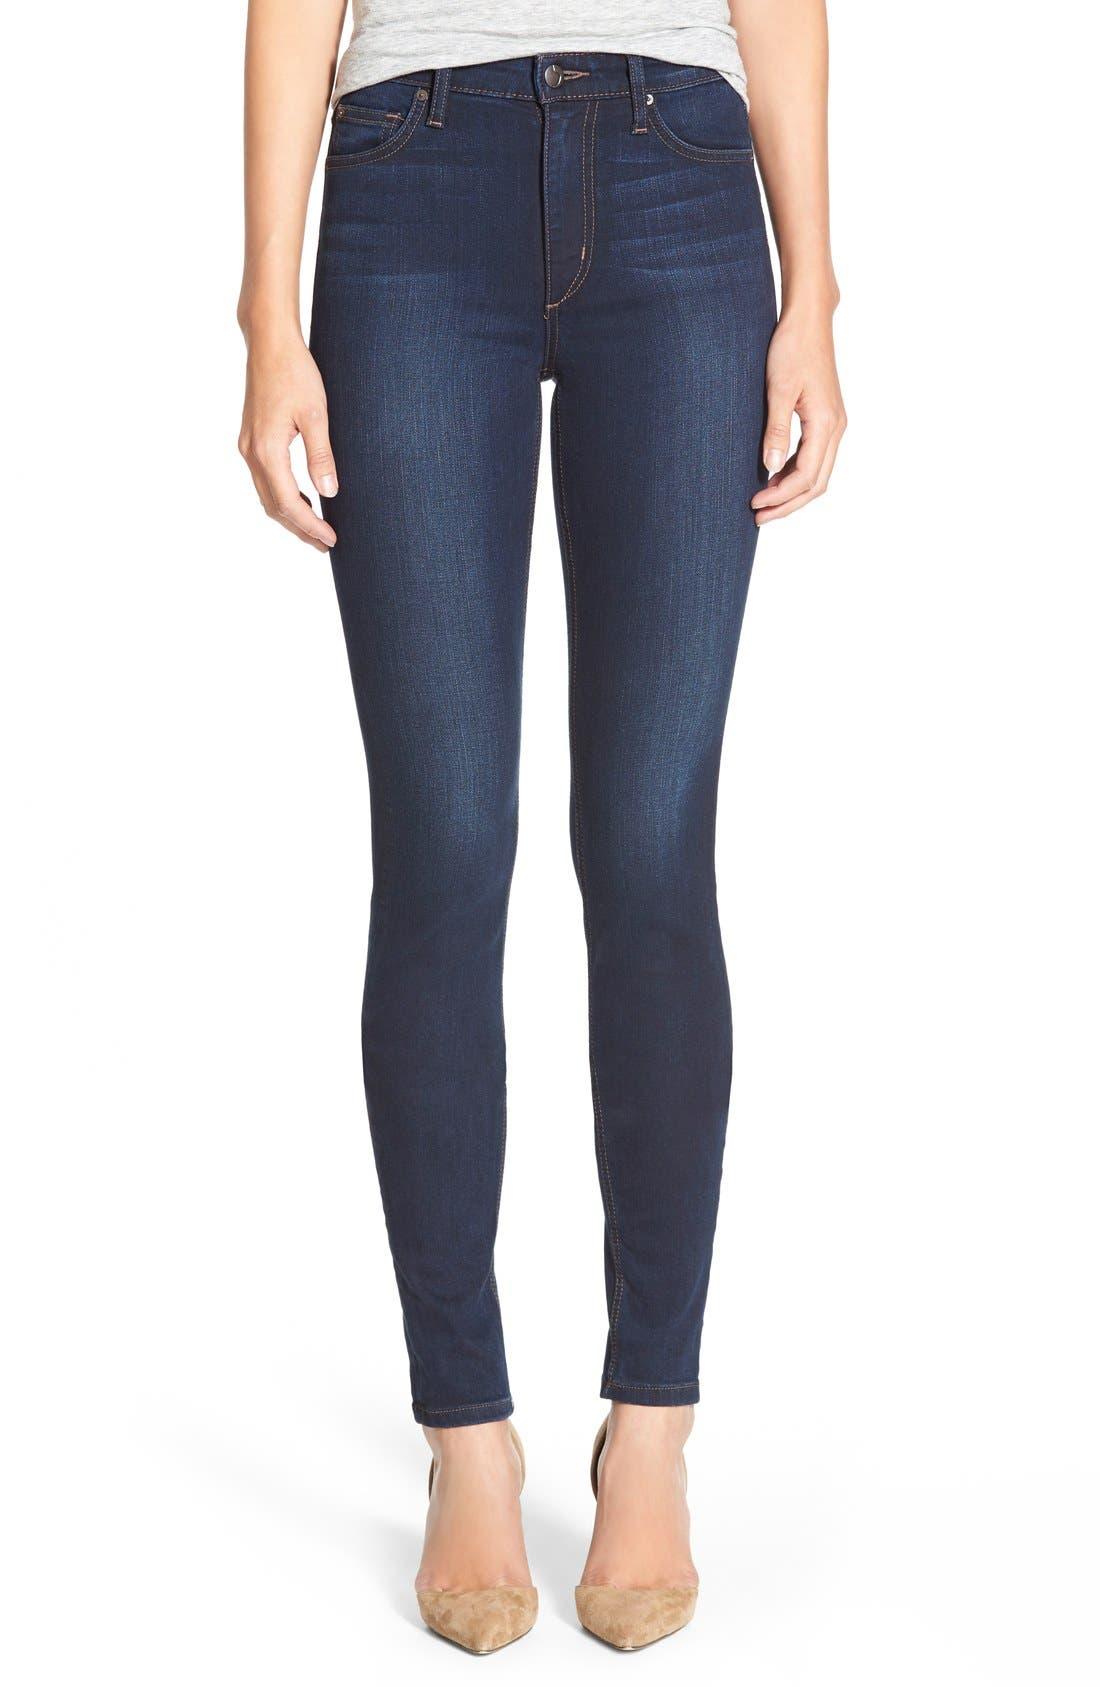 Main Image - Joe's 'Flawless -Charlie' High Rise Skinny Jeans (Cecily)